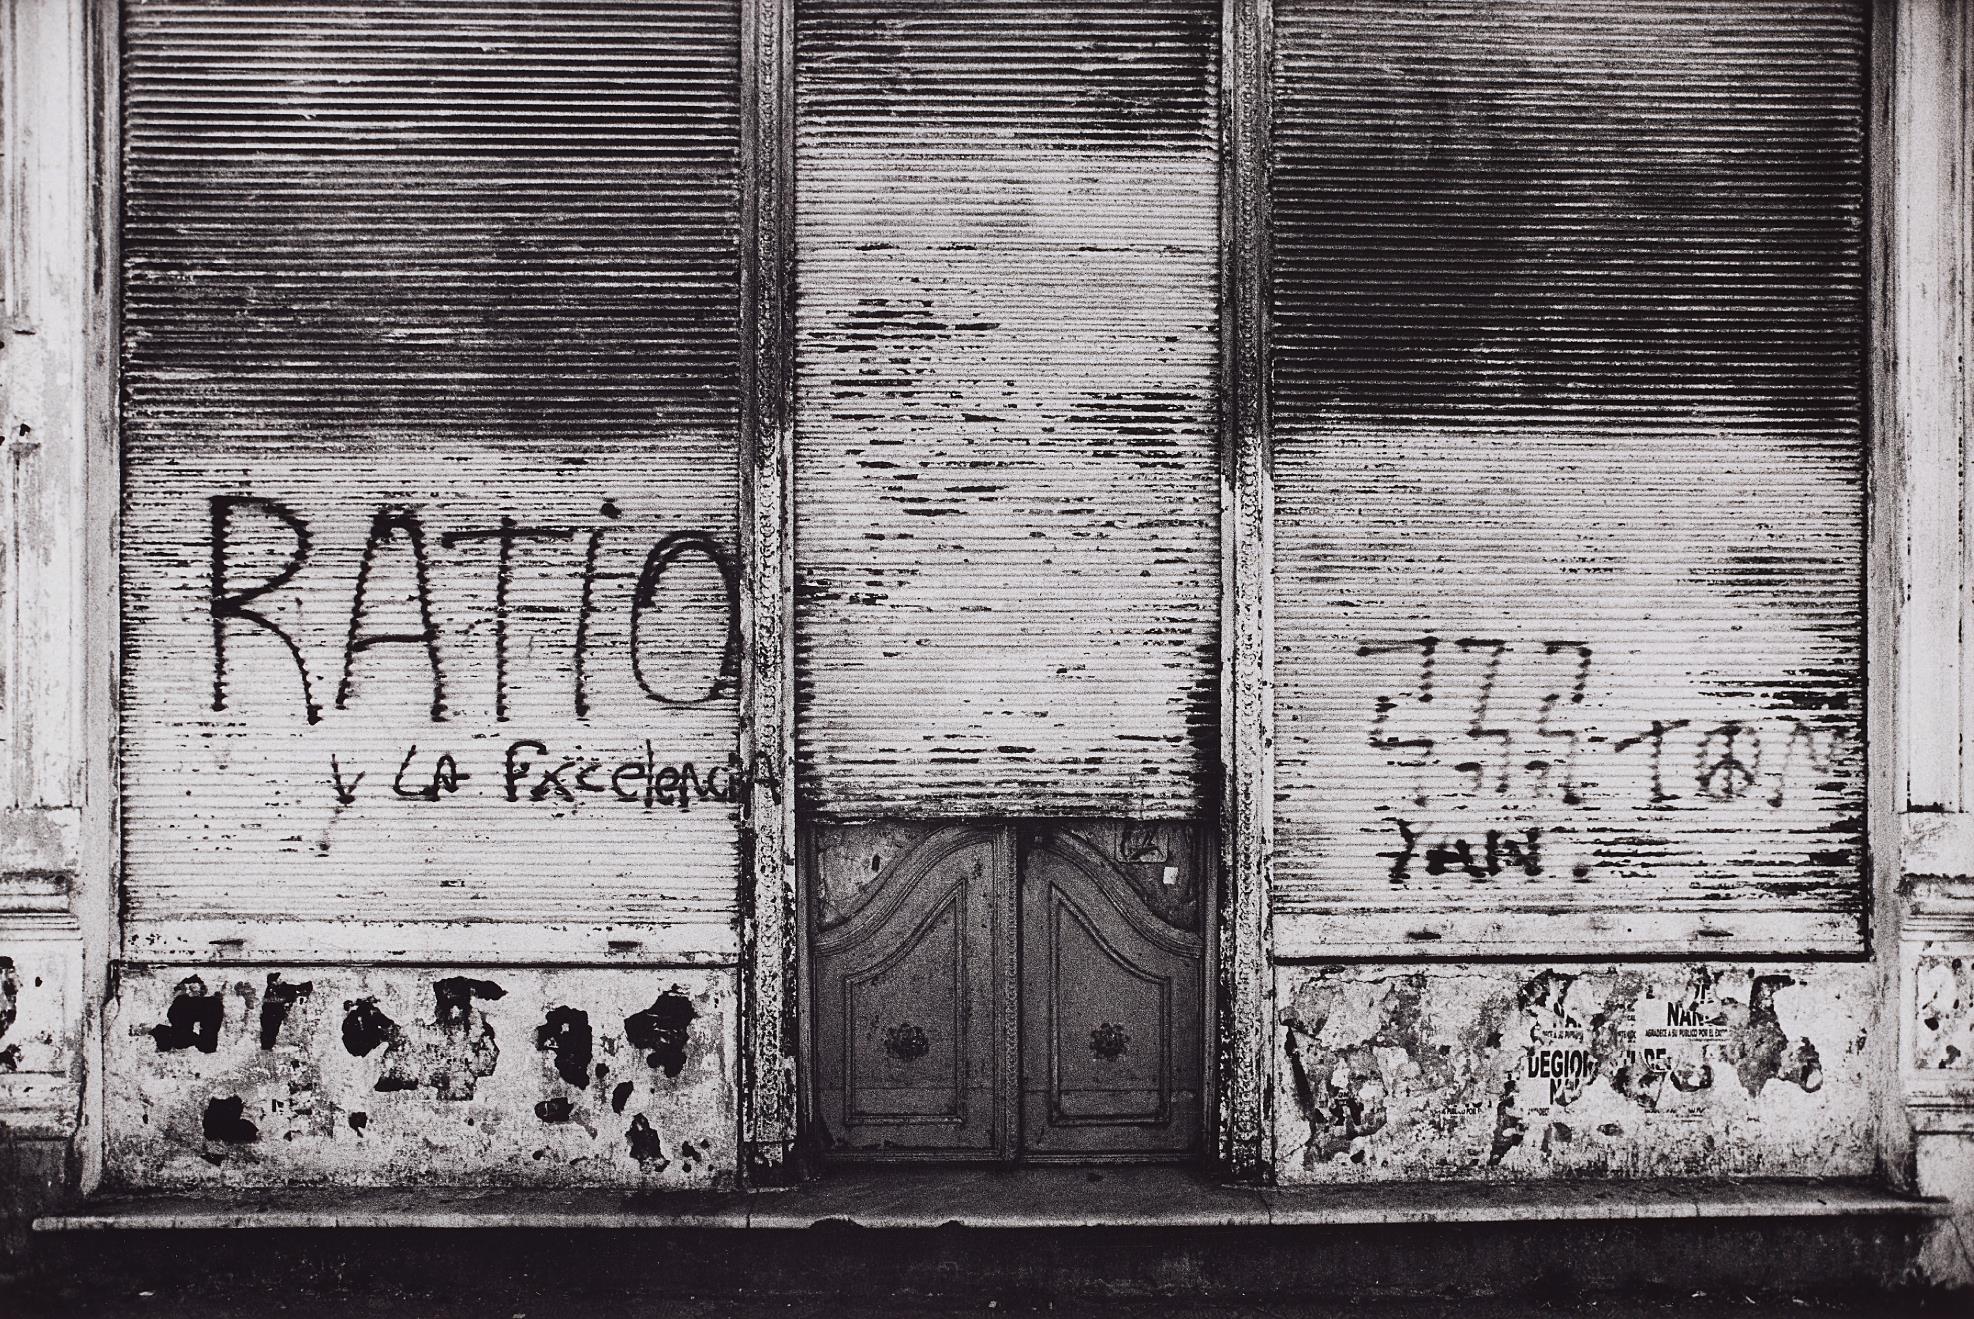 Facundo de Zuviria-Ratio From Siesta Argentina-2003